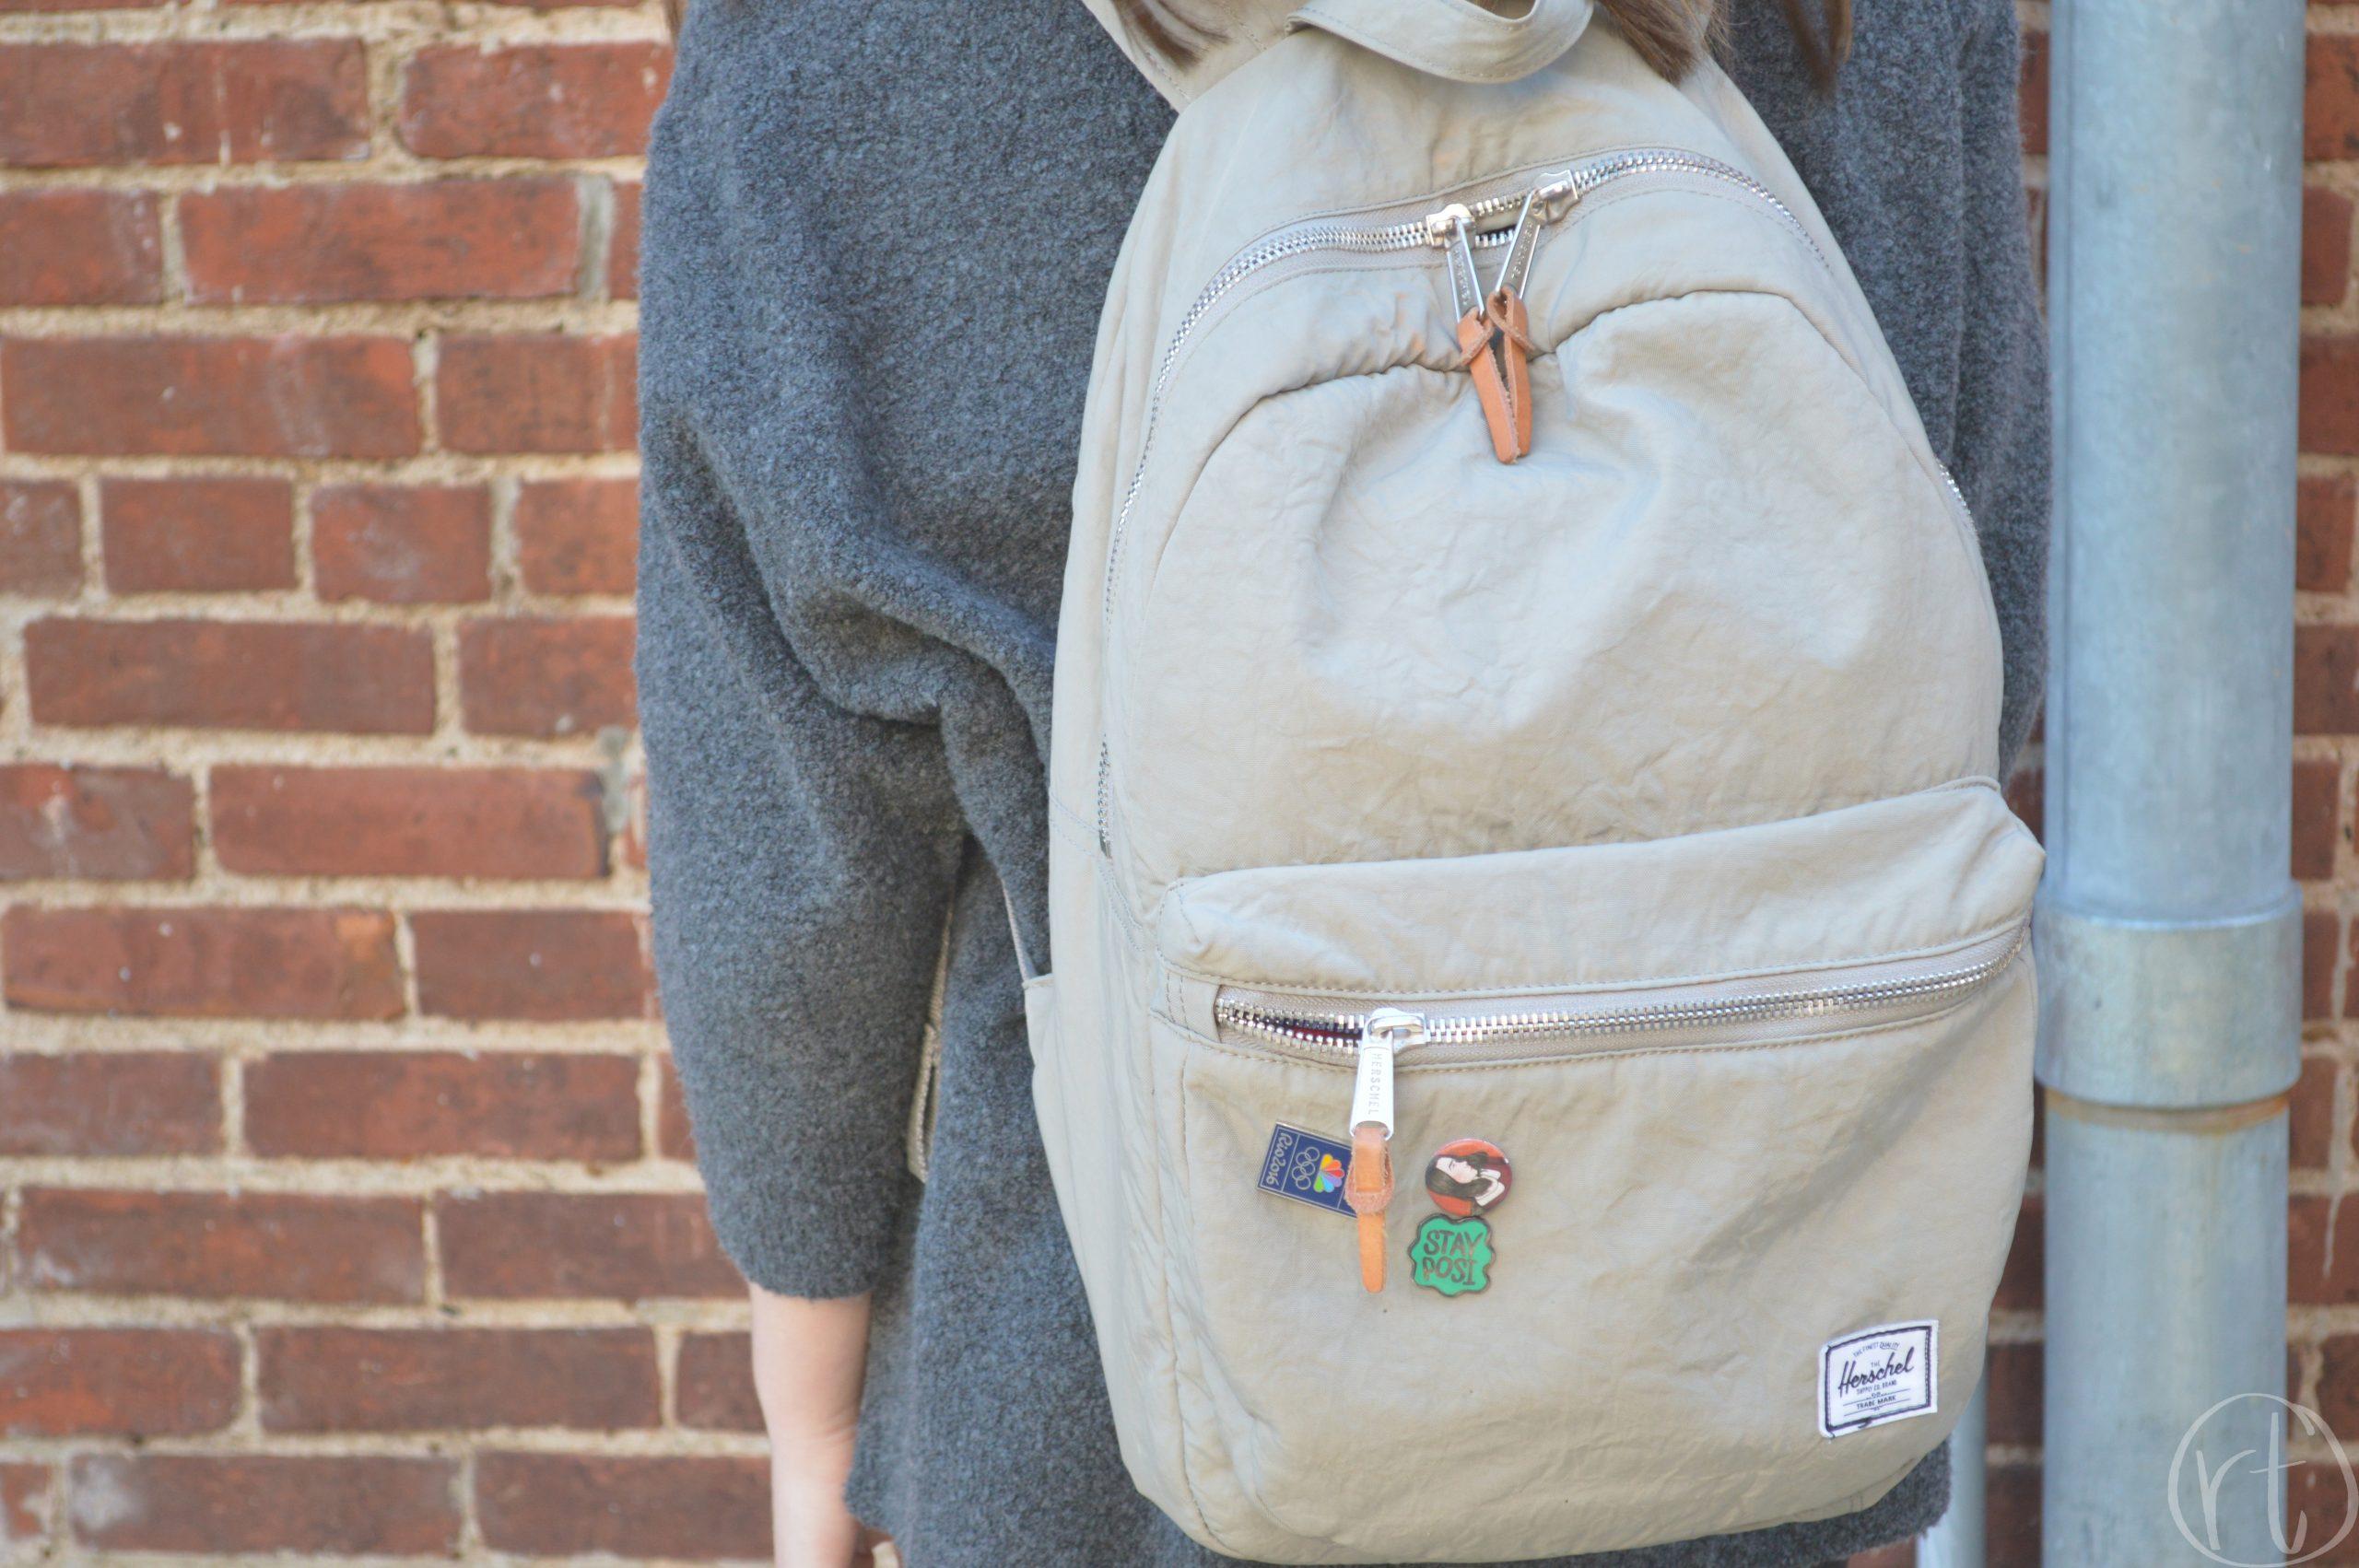 how-to-wear-a-travel-backpack-herschel-pins-round-trip-travel